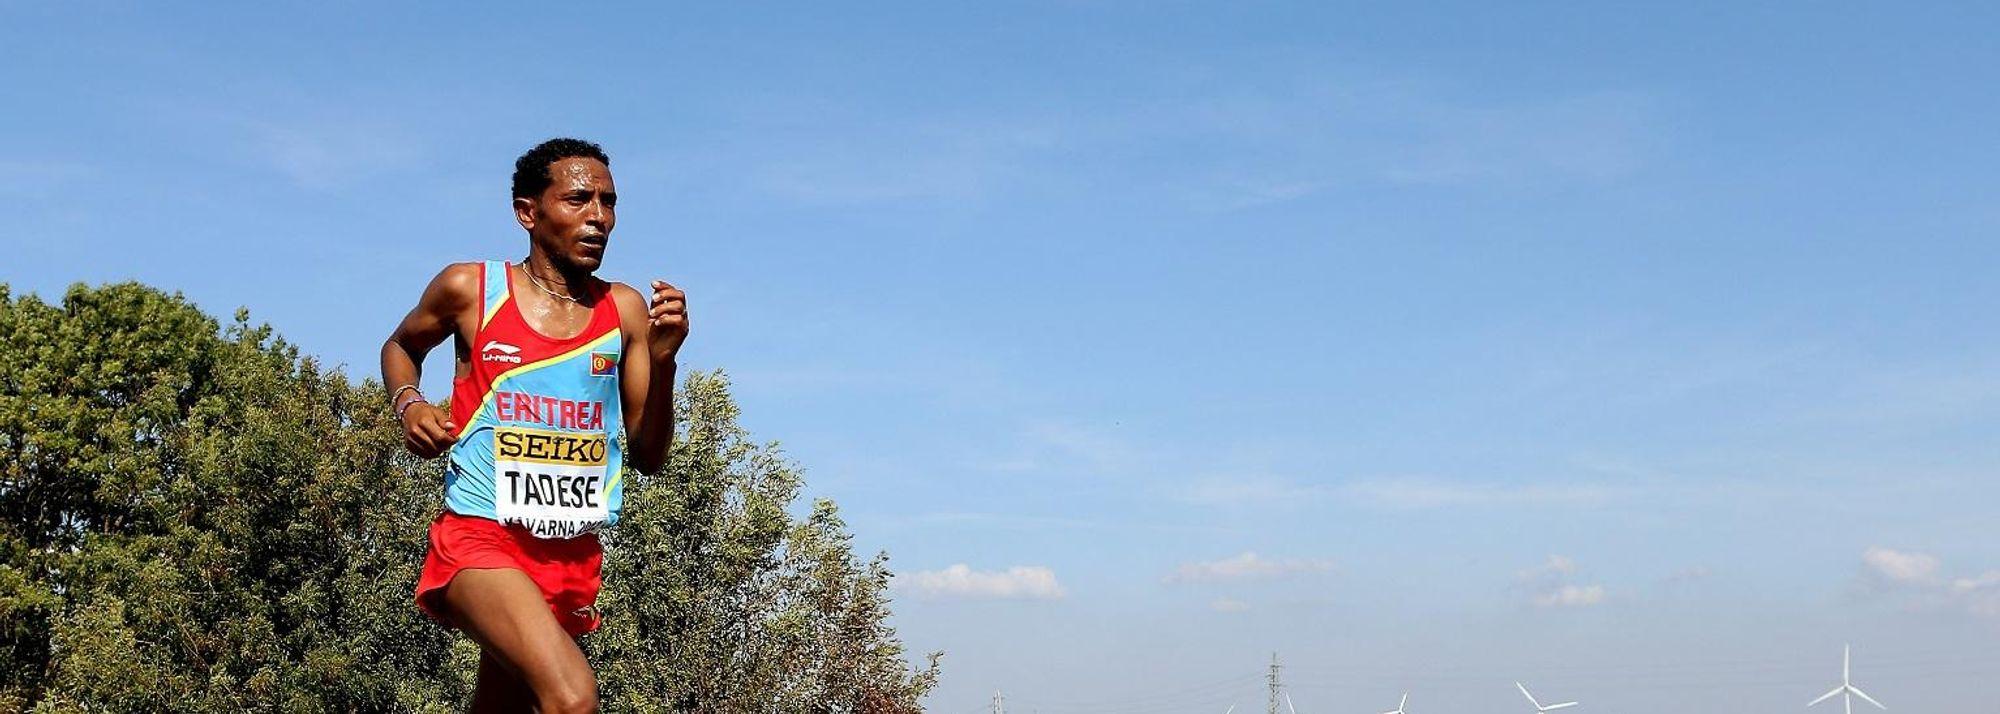 Dominating the proceedings from just beyond the fifth kilometre, Zersenay Tadese of Eritrea won an unprecedented fifth World Half Marathon title in Kavarna, Bulgaria, today.